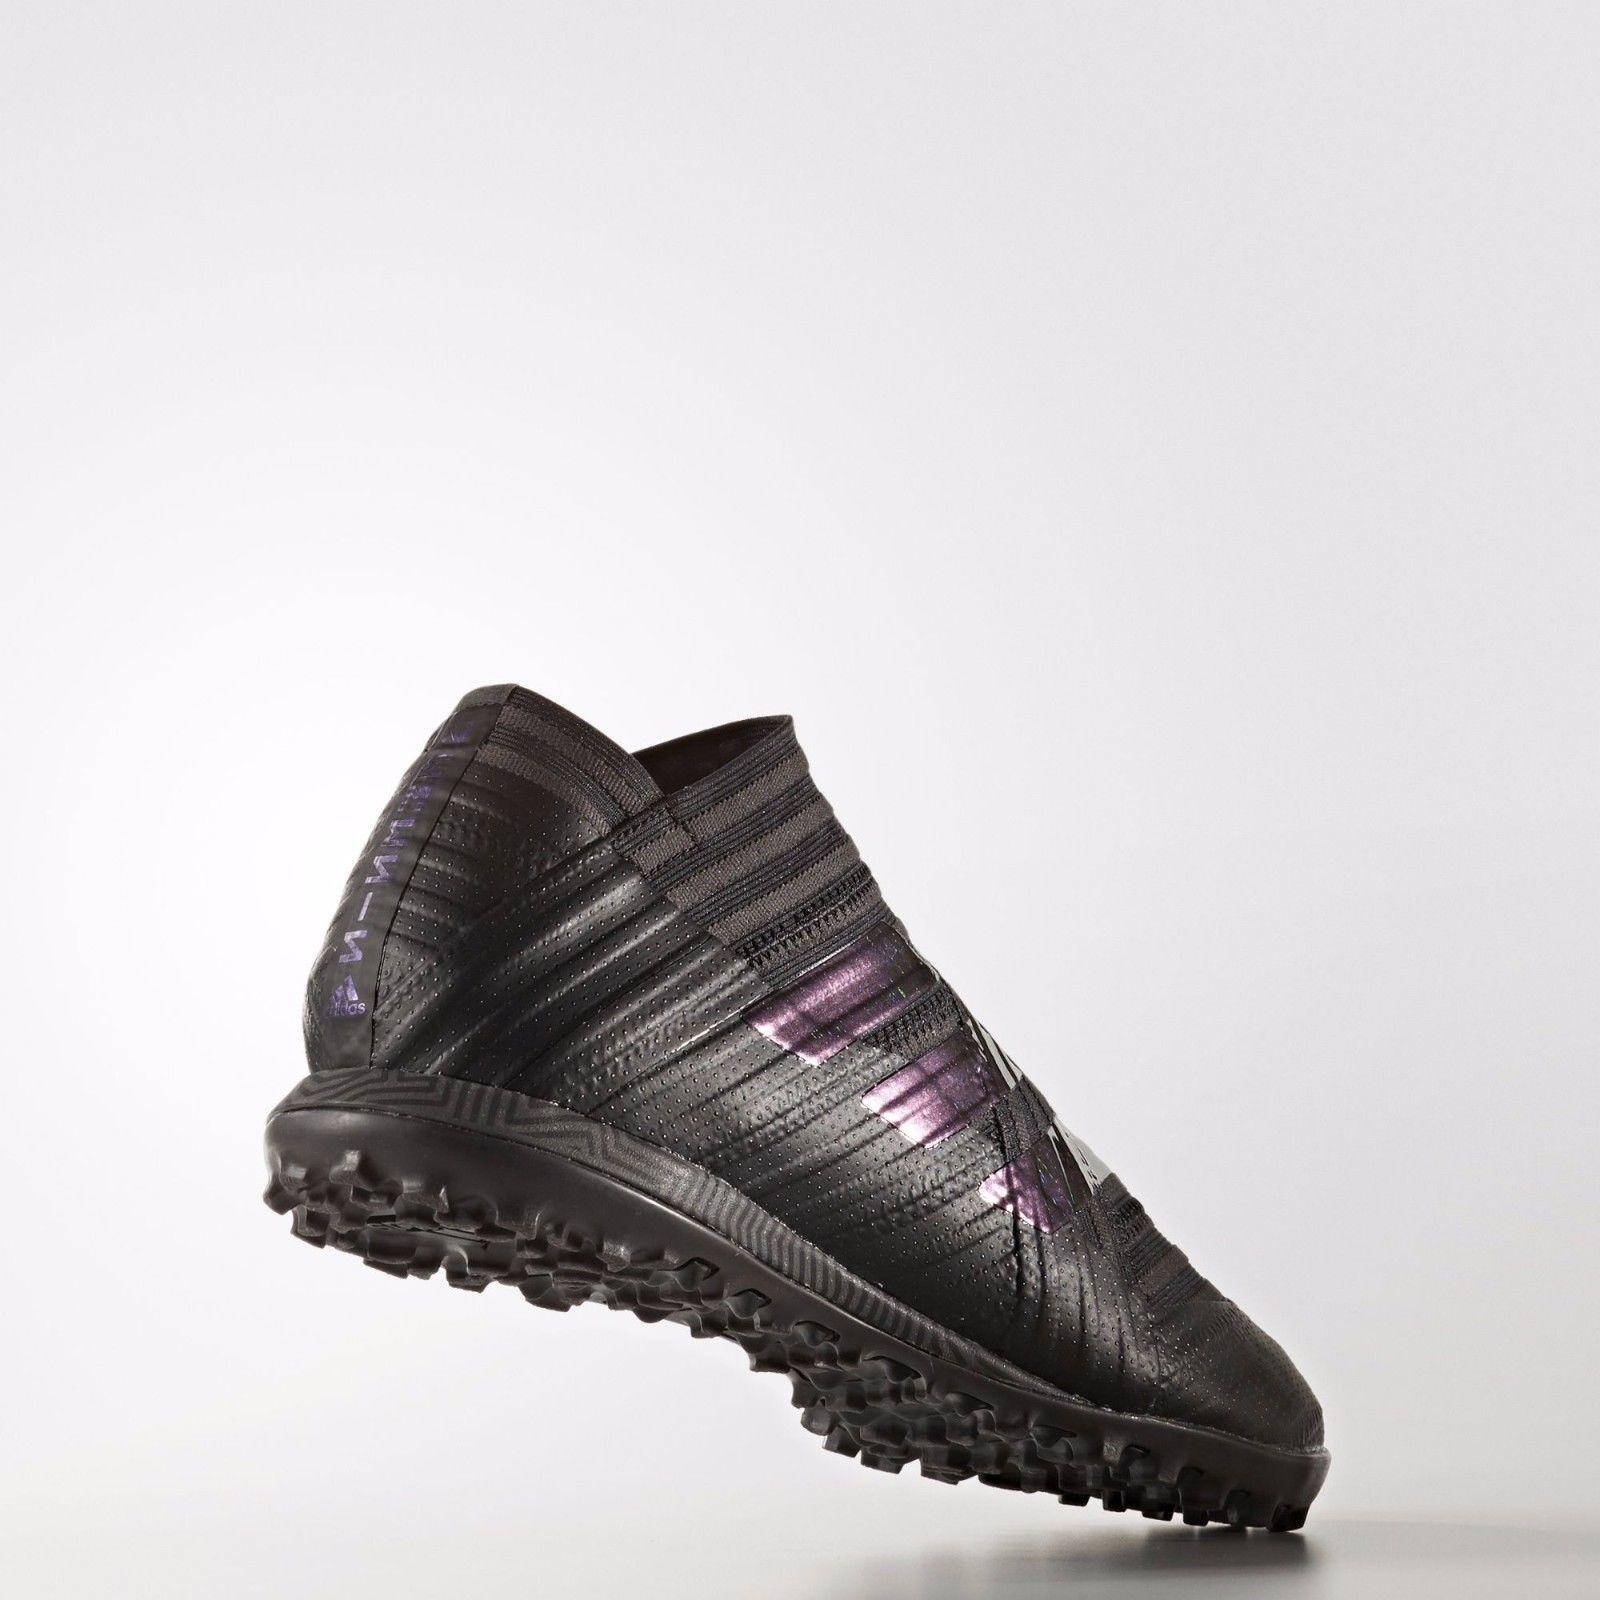 65c15f583a1c Adidas Nemeziz Tango 17+ 360 Agility Turf and 50 similar items